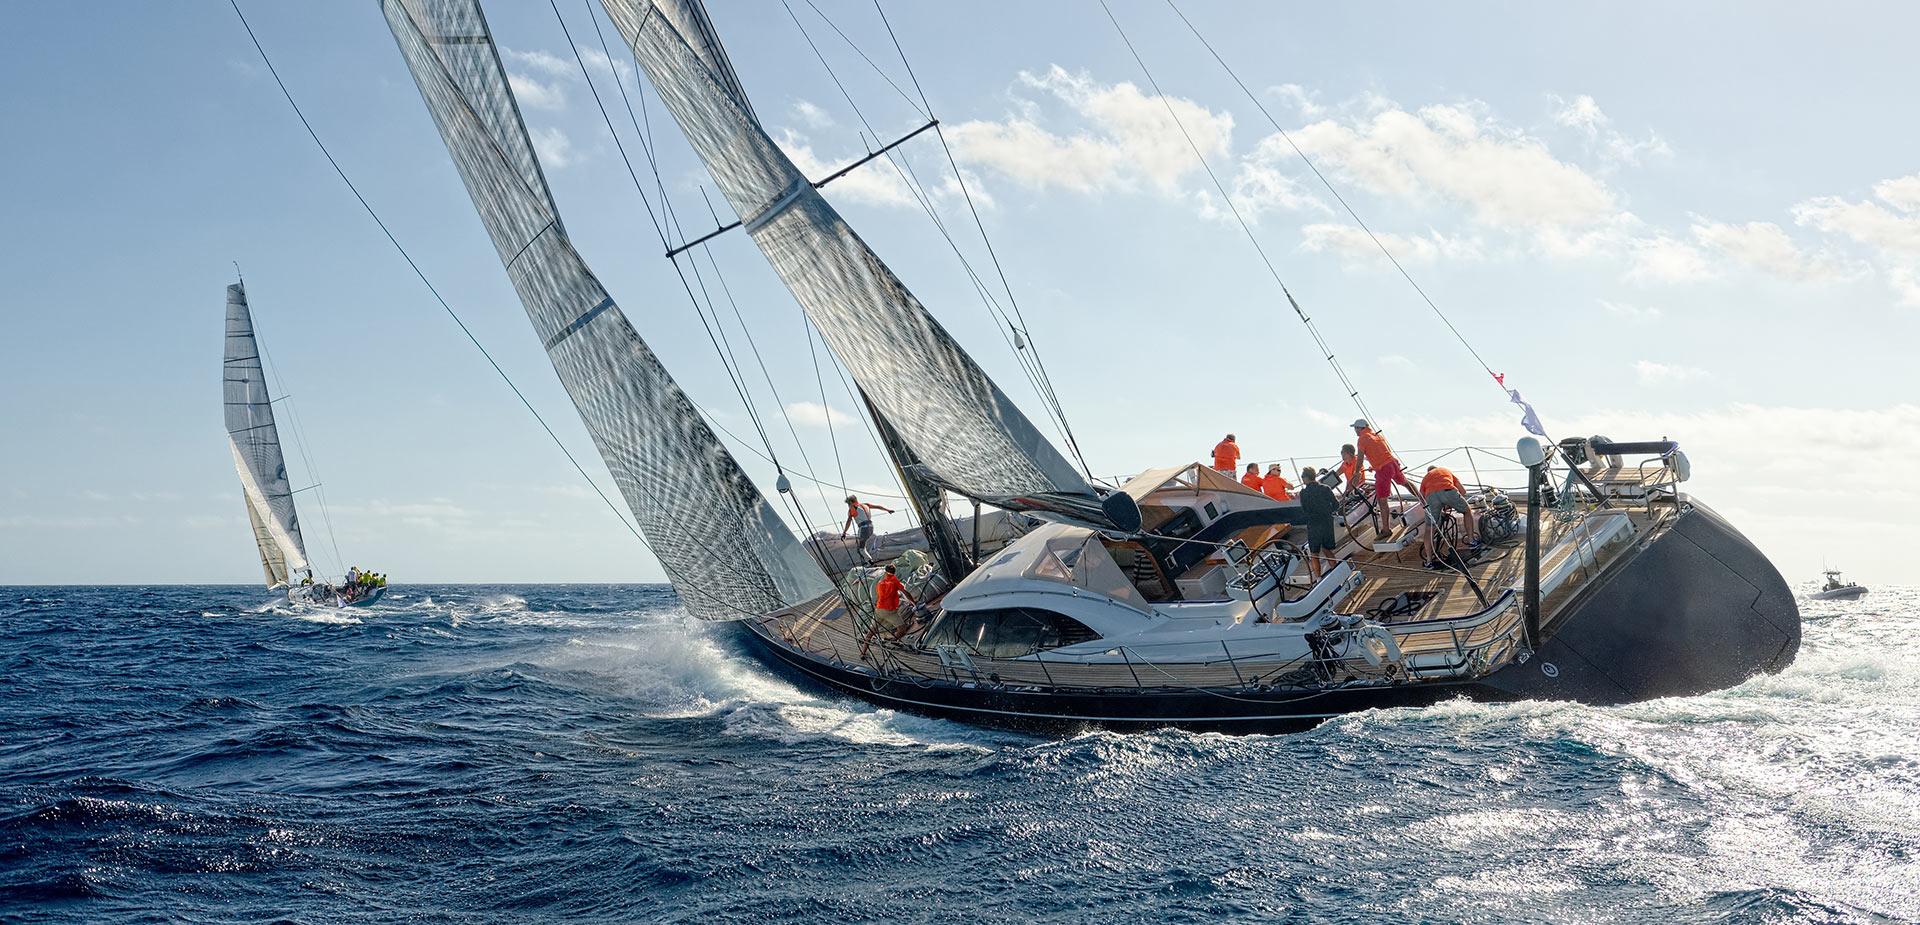 Sailing Yacht - Team Bios